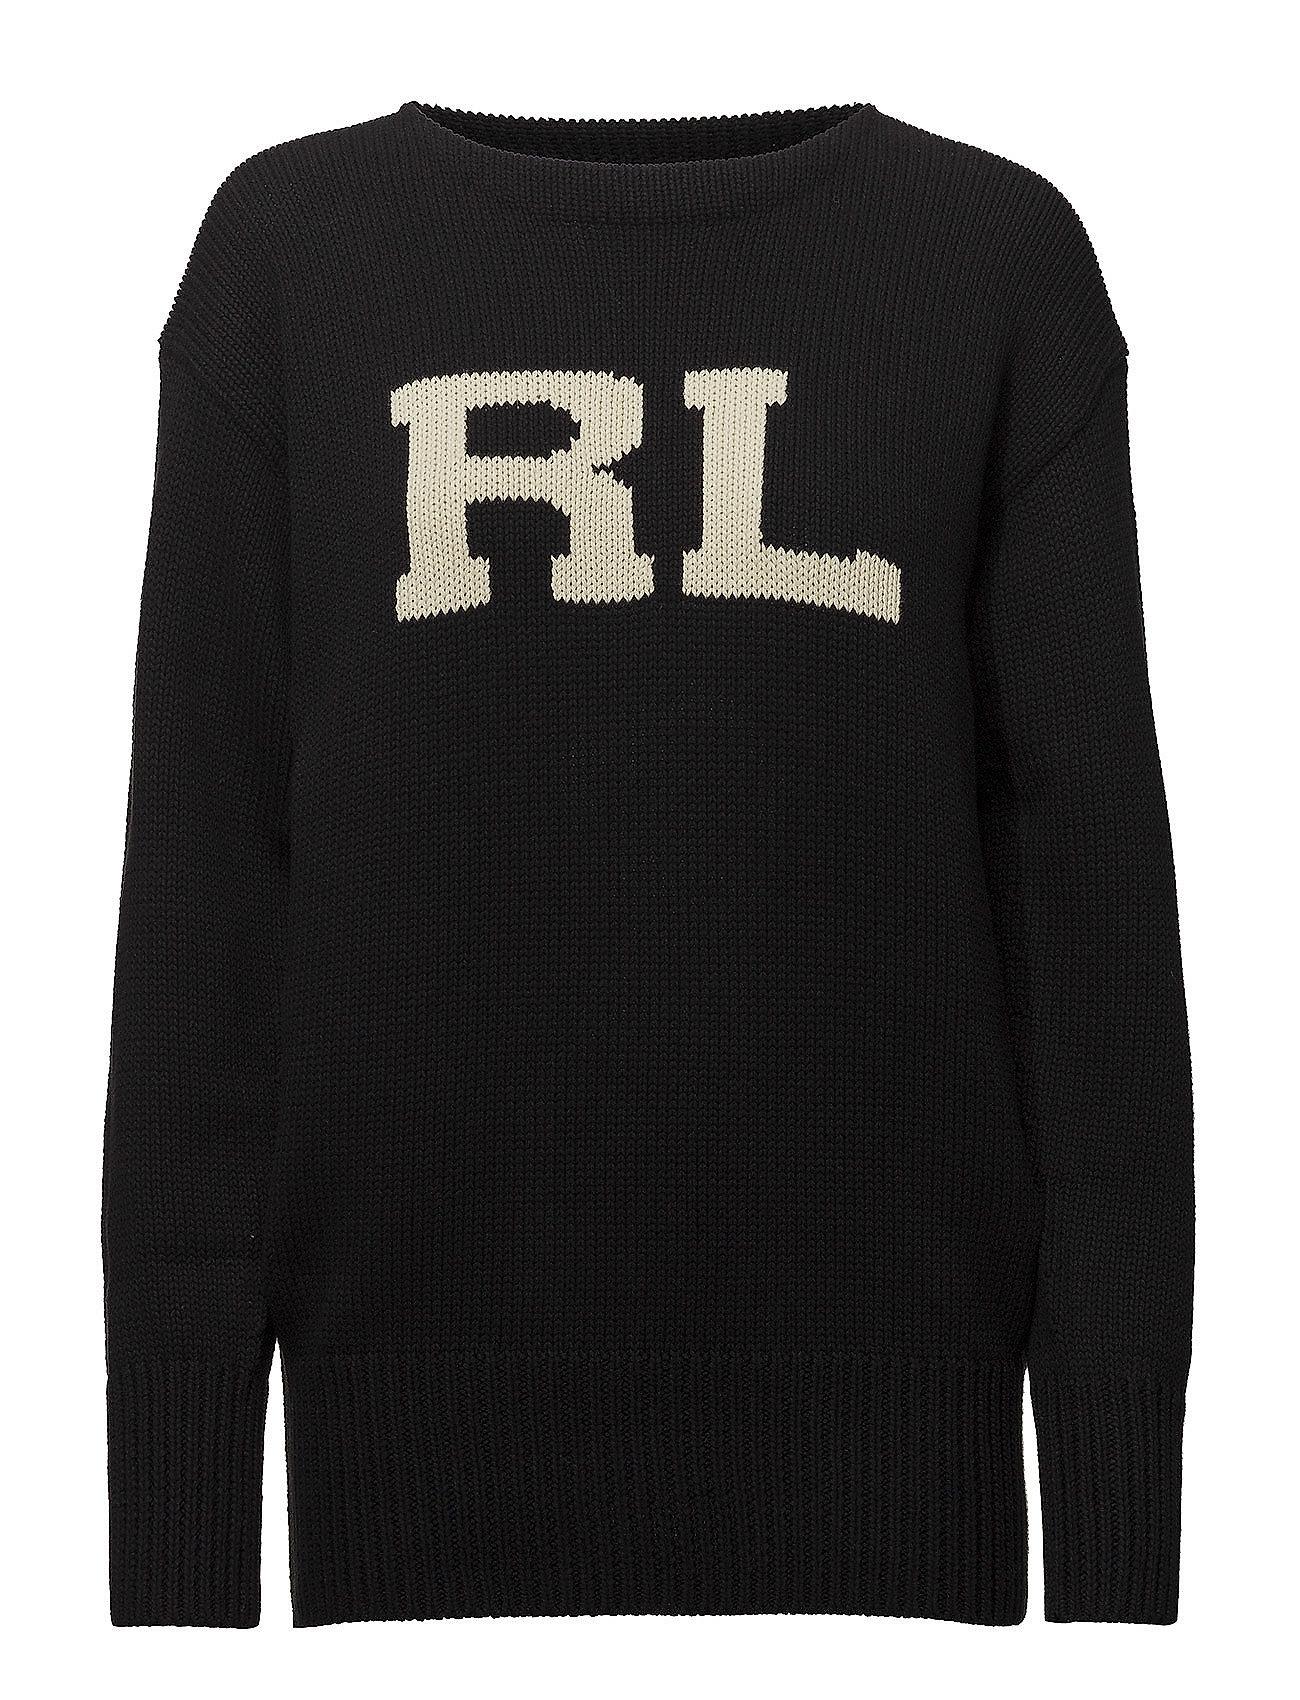 5ec179e2fab Rl Cotton Crewneck Sweater (Black cream) (£105) - Polo Ralph Lauren ...